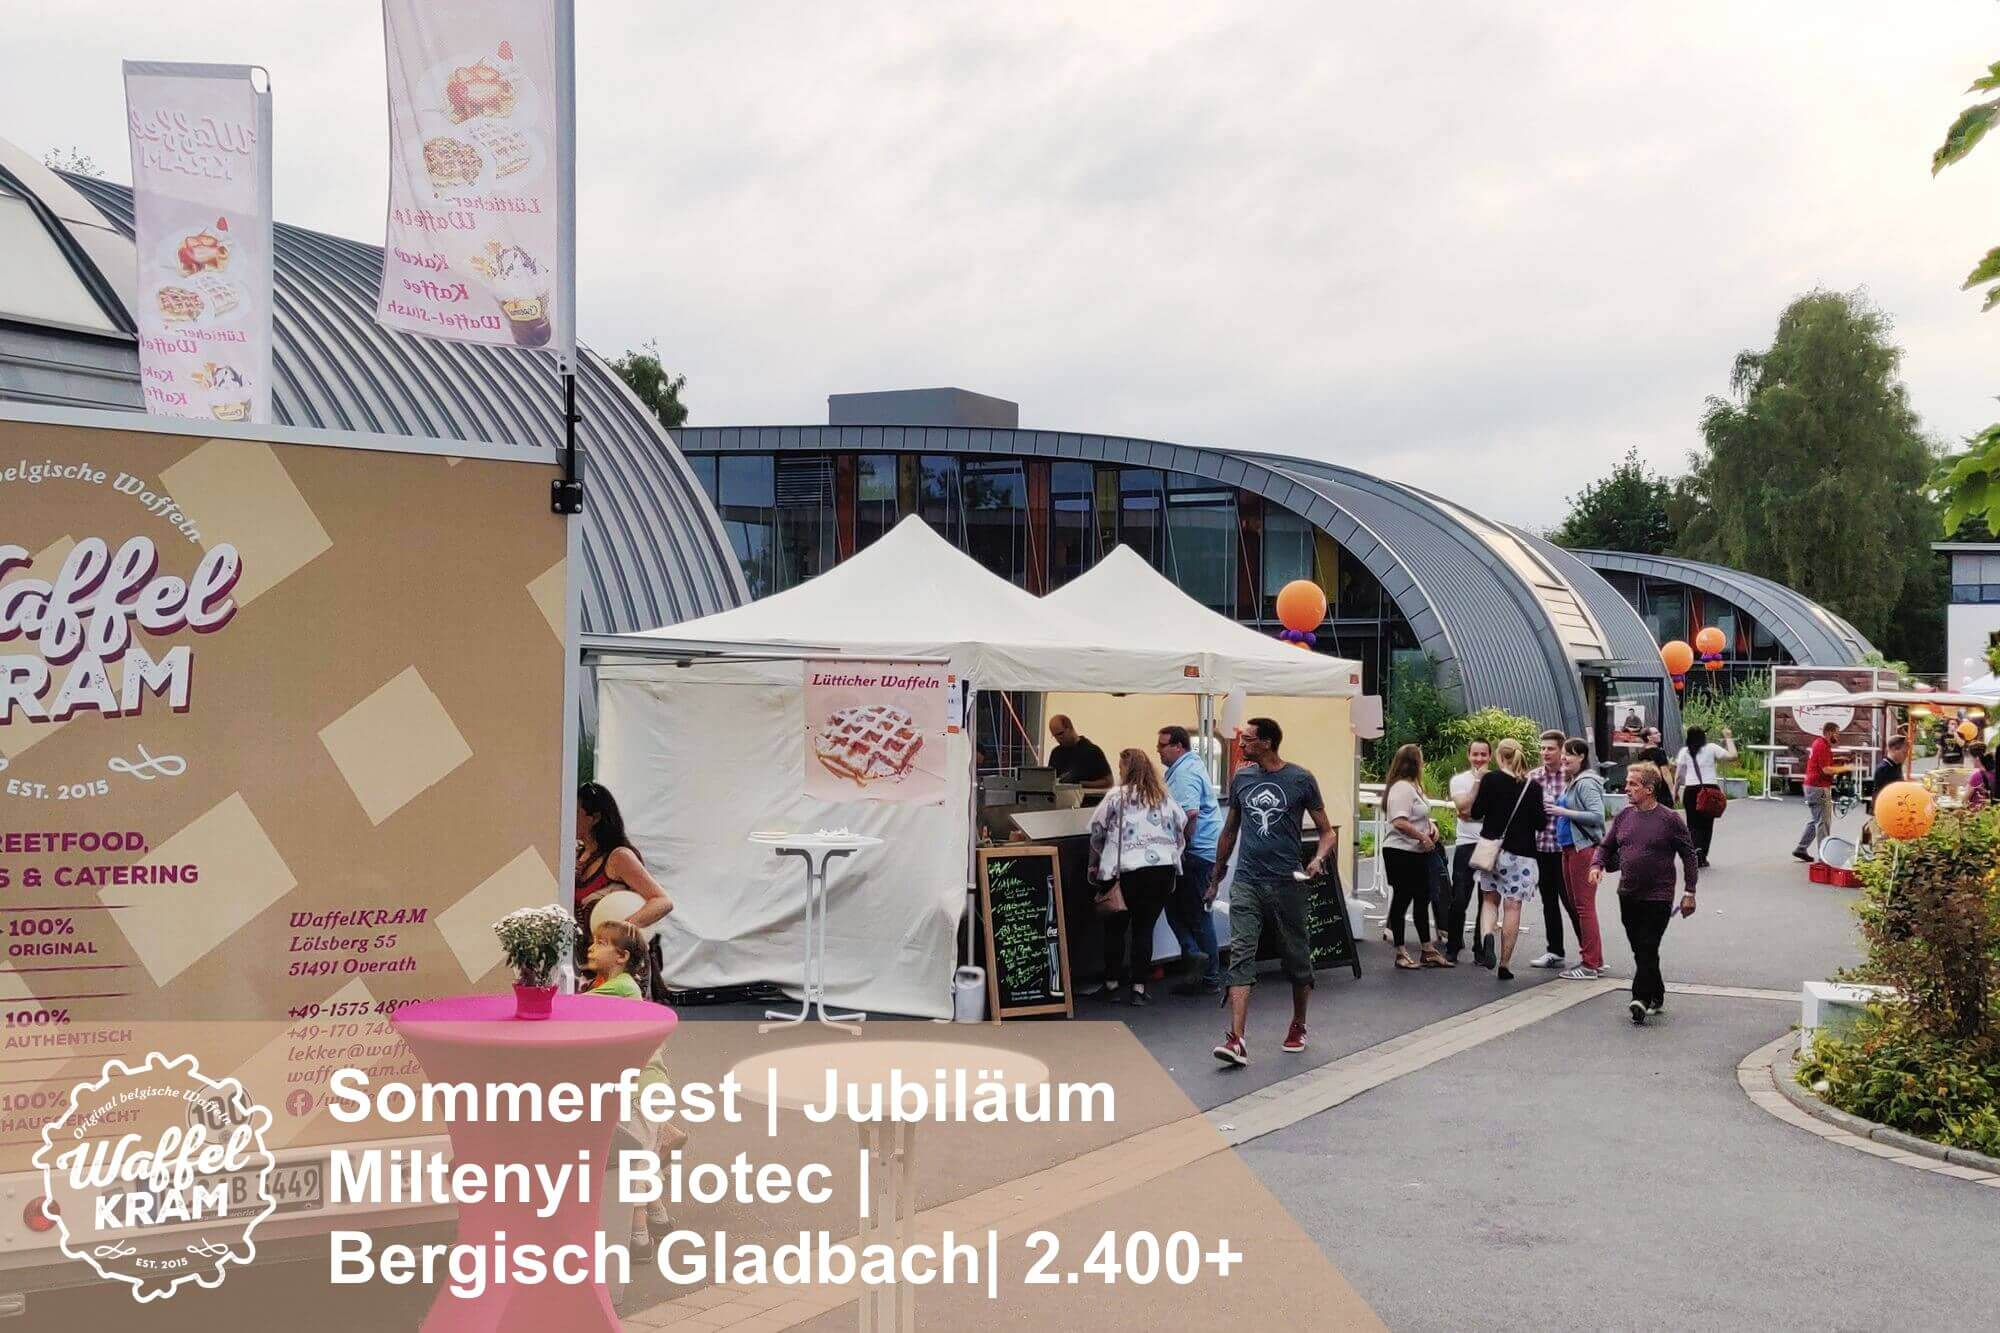 catering-sommerfest-miltenyi-biotec-bergisch-gladbach-tx